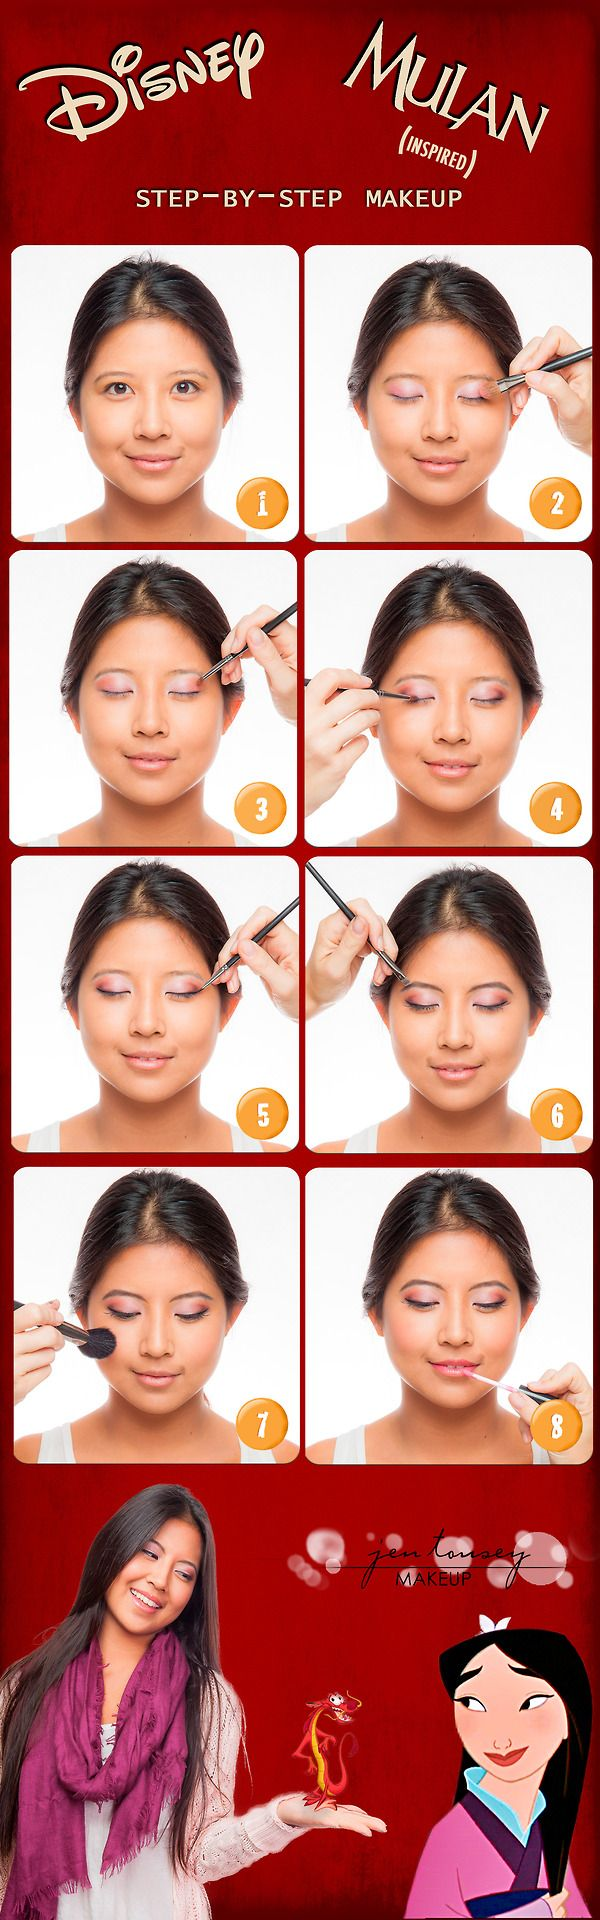 #disneyside #jentouseymakeup #mulan #mushu #beautifullydisney #diy #makeup